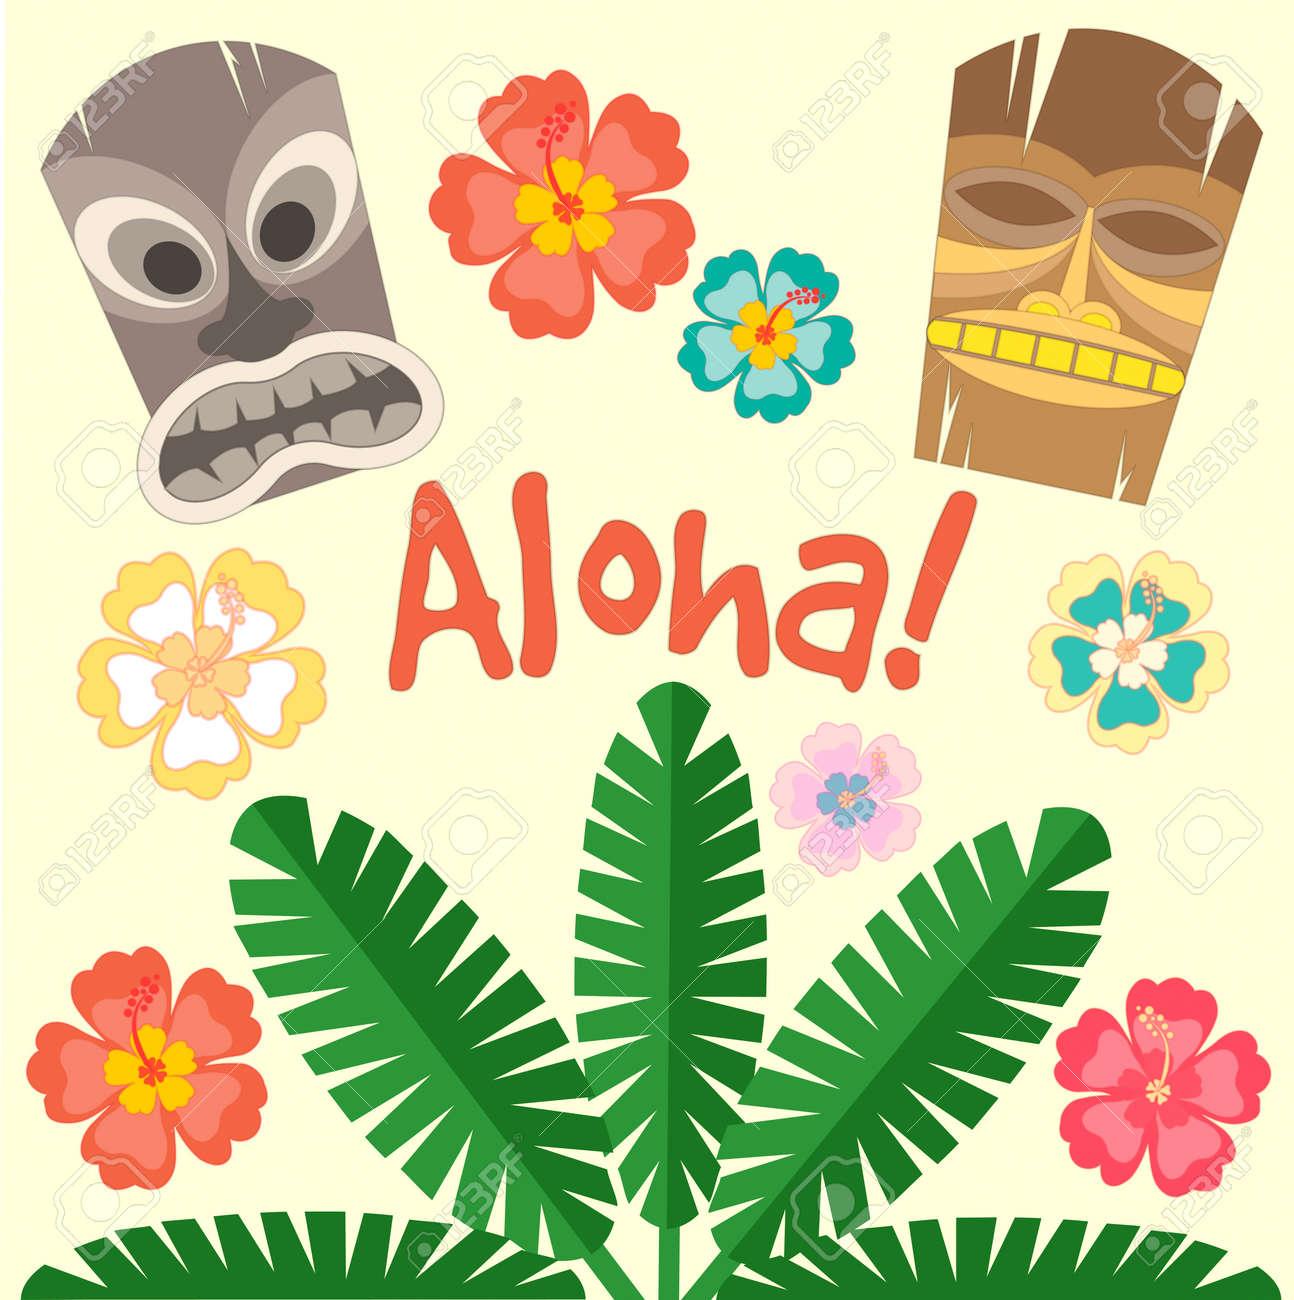 Hawaii Aloha Poster. Vector Il...